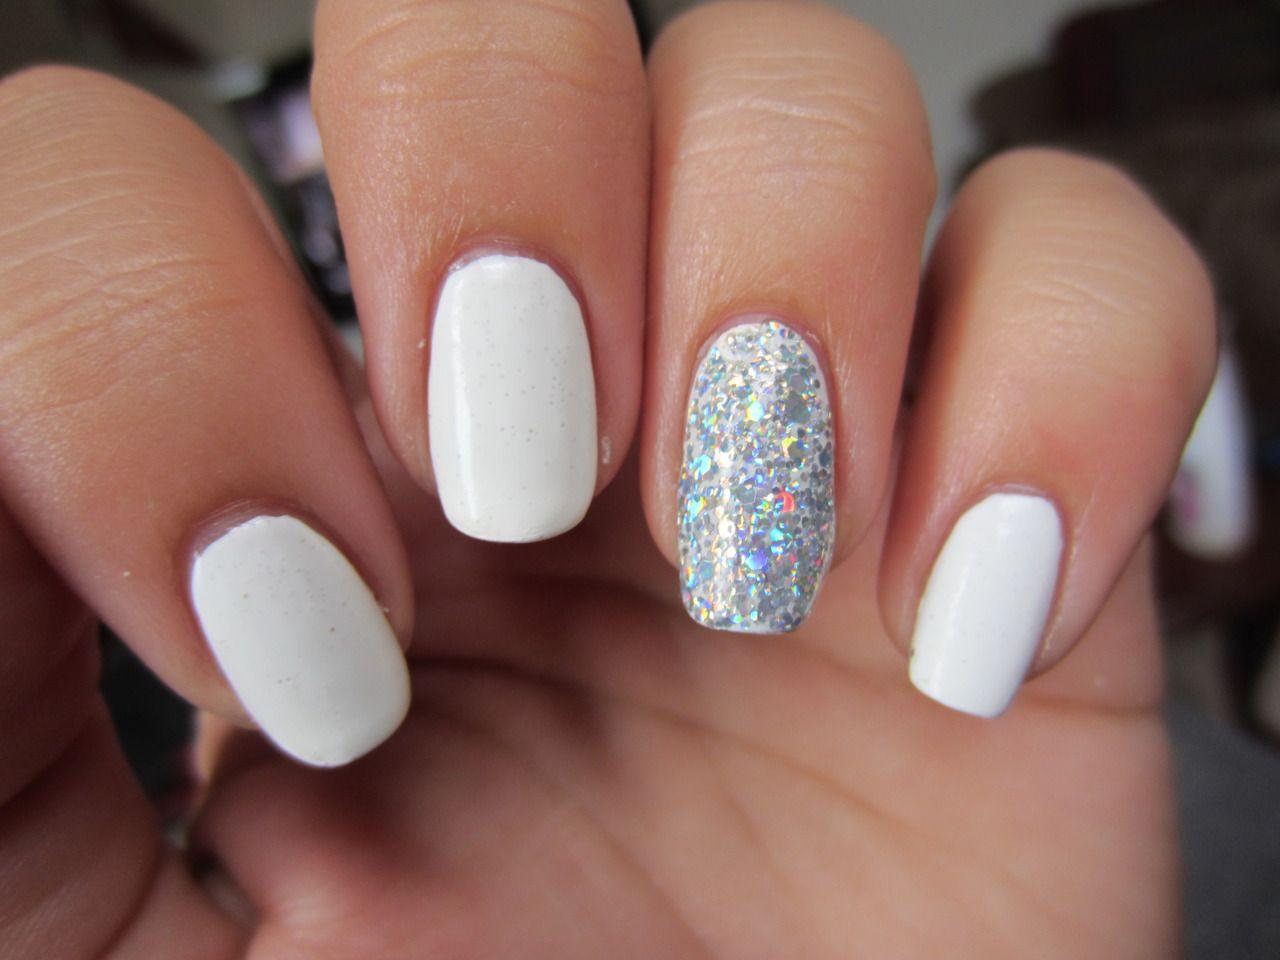 White Acrylic Nails Tumblr Nail Arts White And Silver Nails White Gel Nails White Acrylic Nails